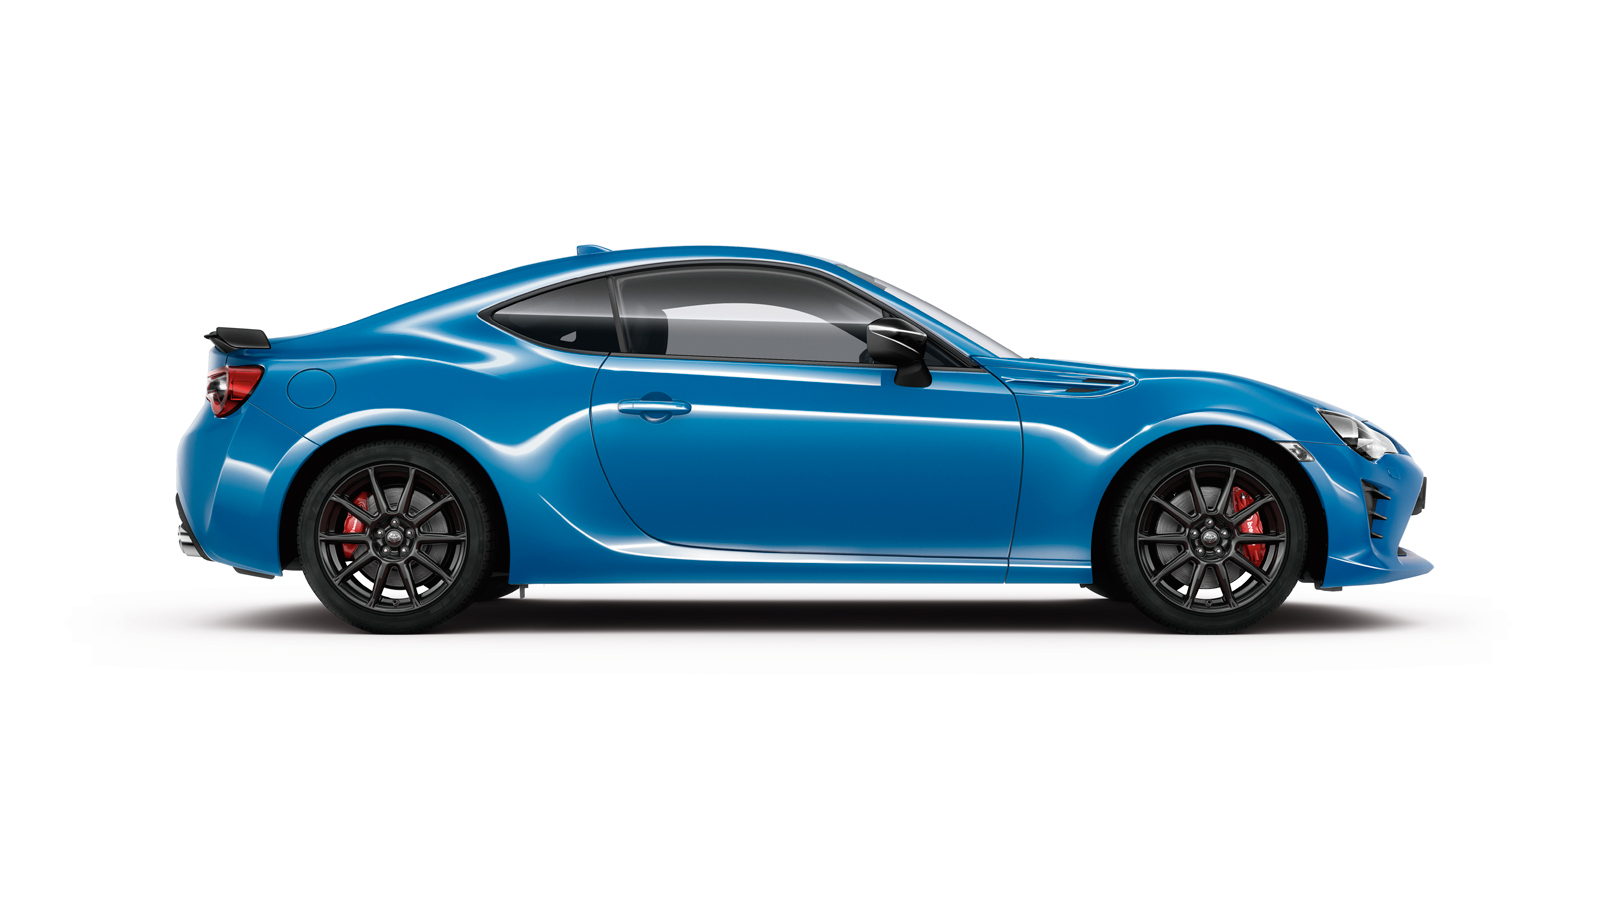 Kekurangan Toyota Gt86 Spesifikasi